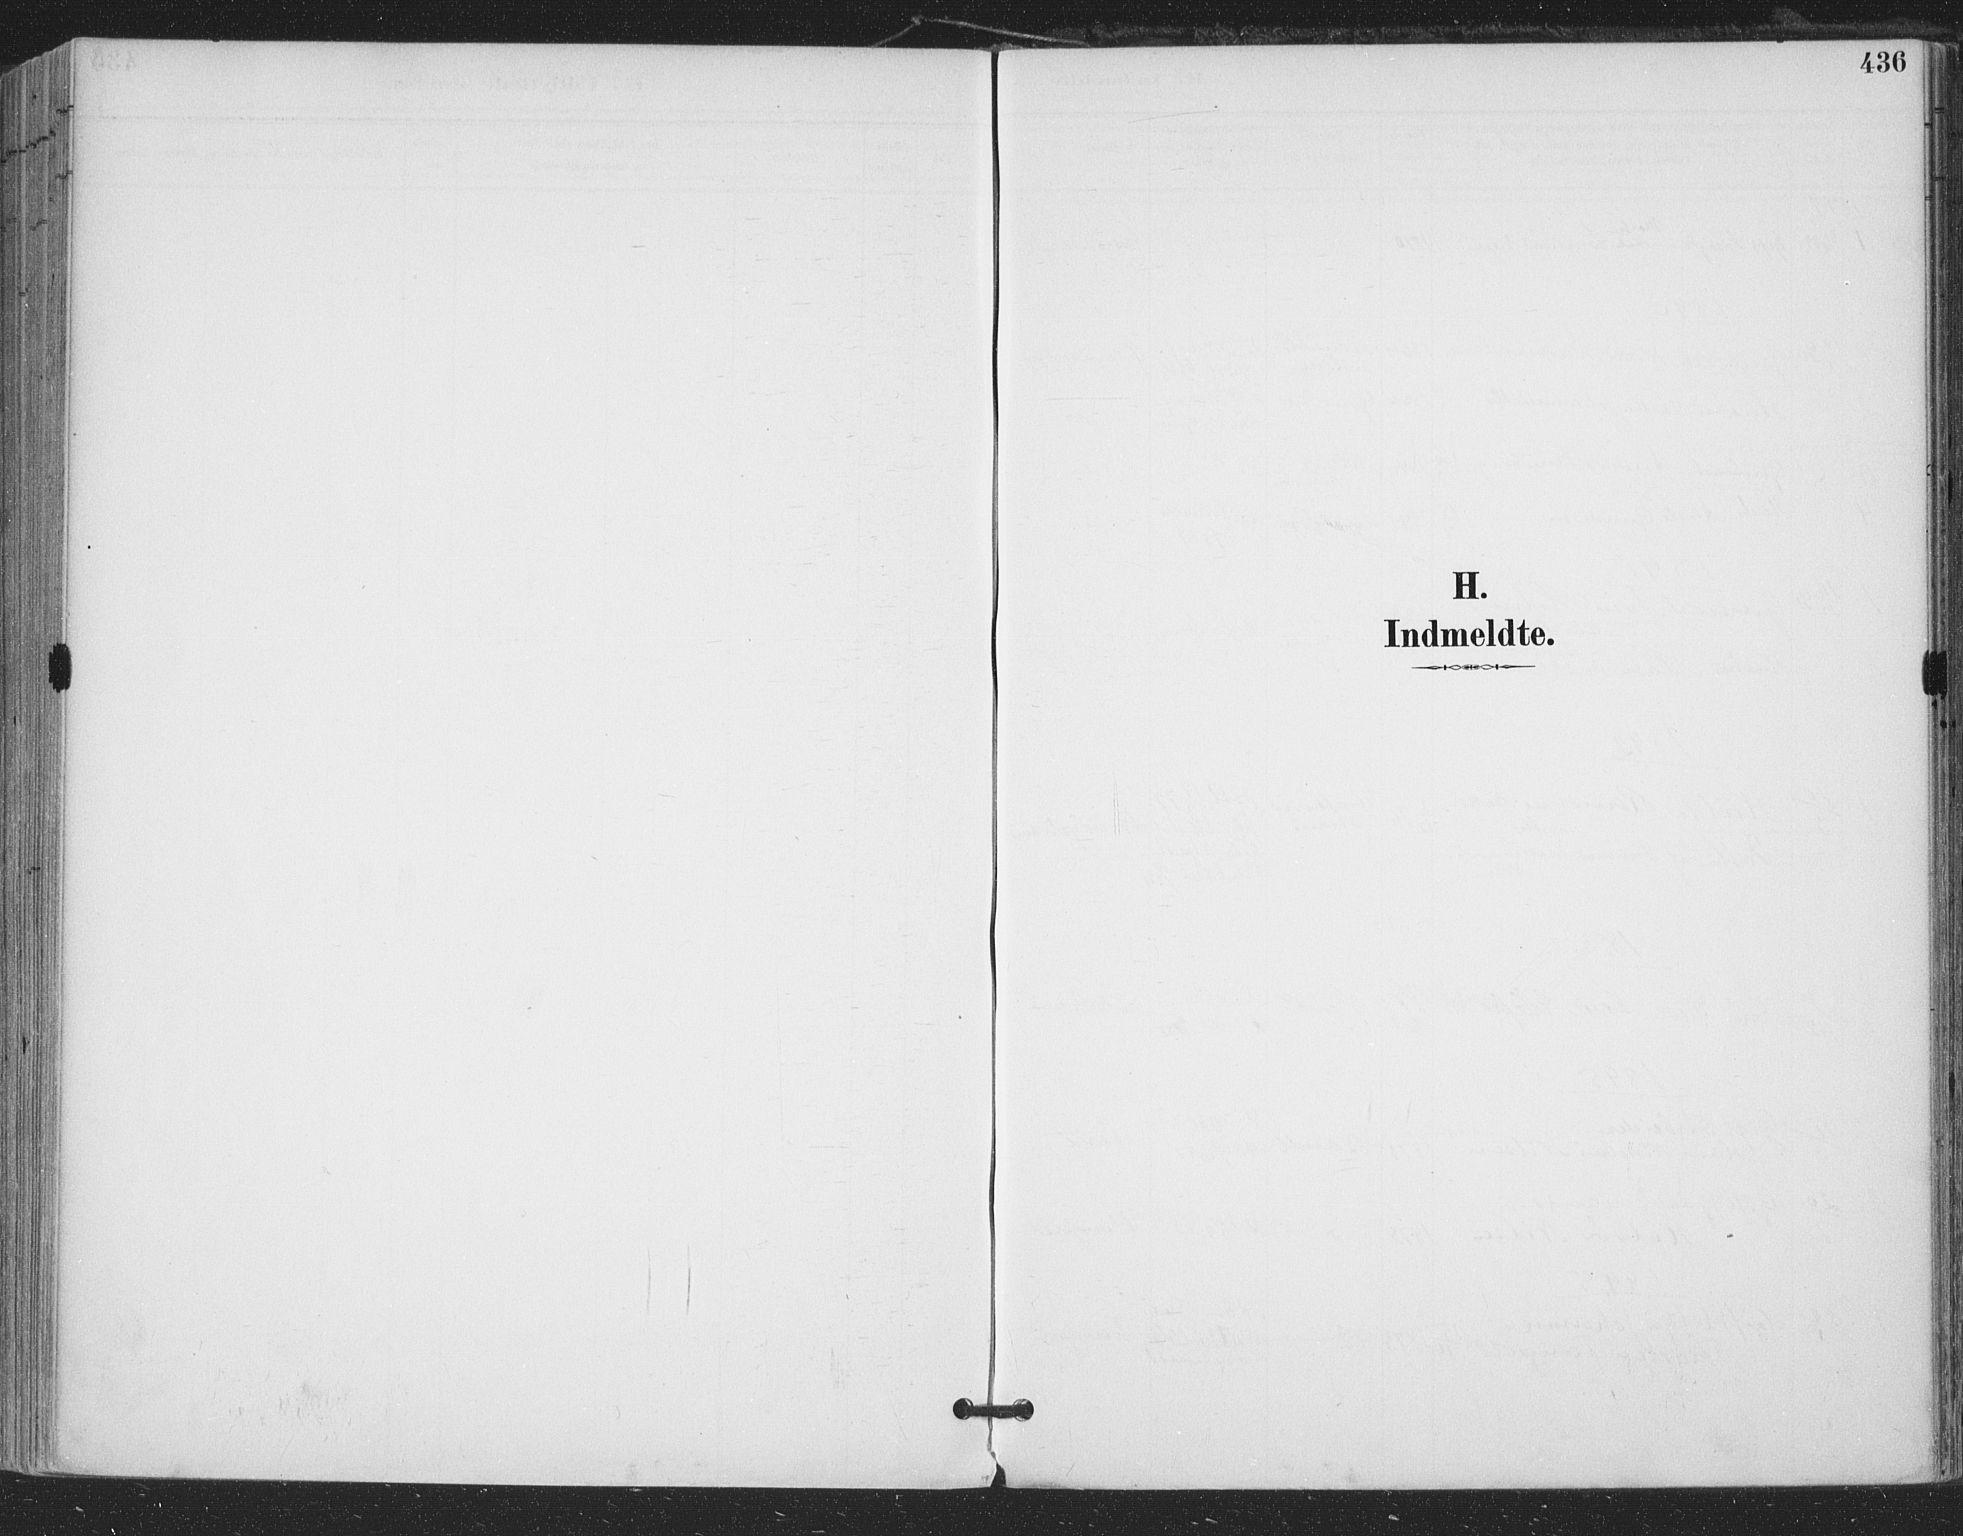 SAKO, Bamble kirkebøker, F/Fa/L0008: Ministerialbok nr. I 8, 1888-1900, s. 436